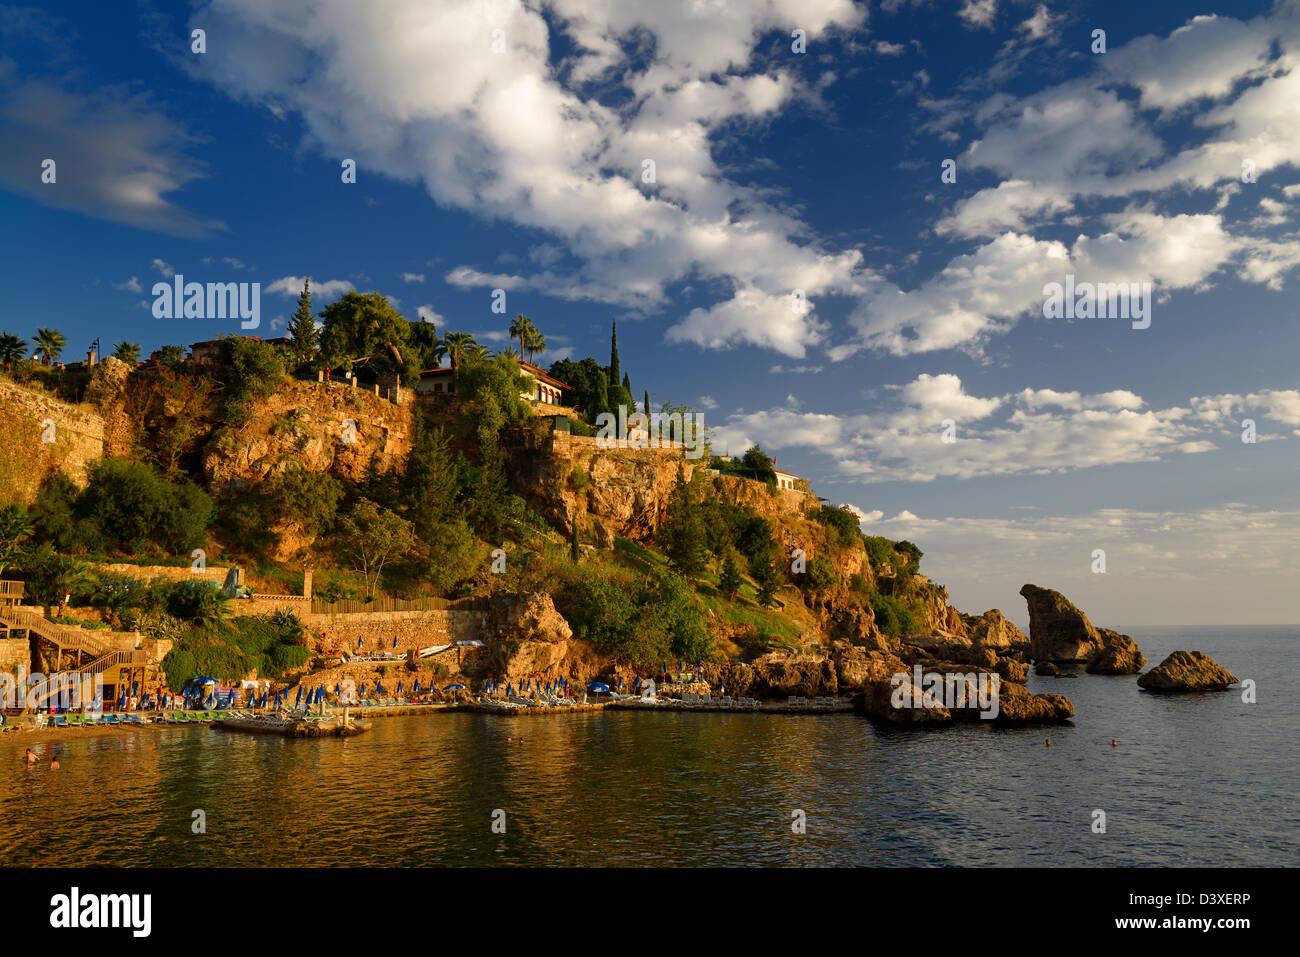 Cliffside resort and beach on Turkish Riviera at Antalya Kaleici Harbour Turkey at sunset - Stock Image